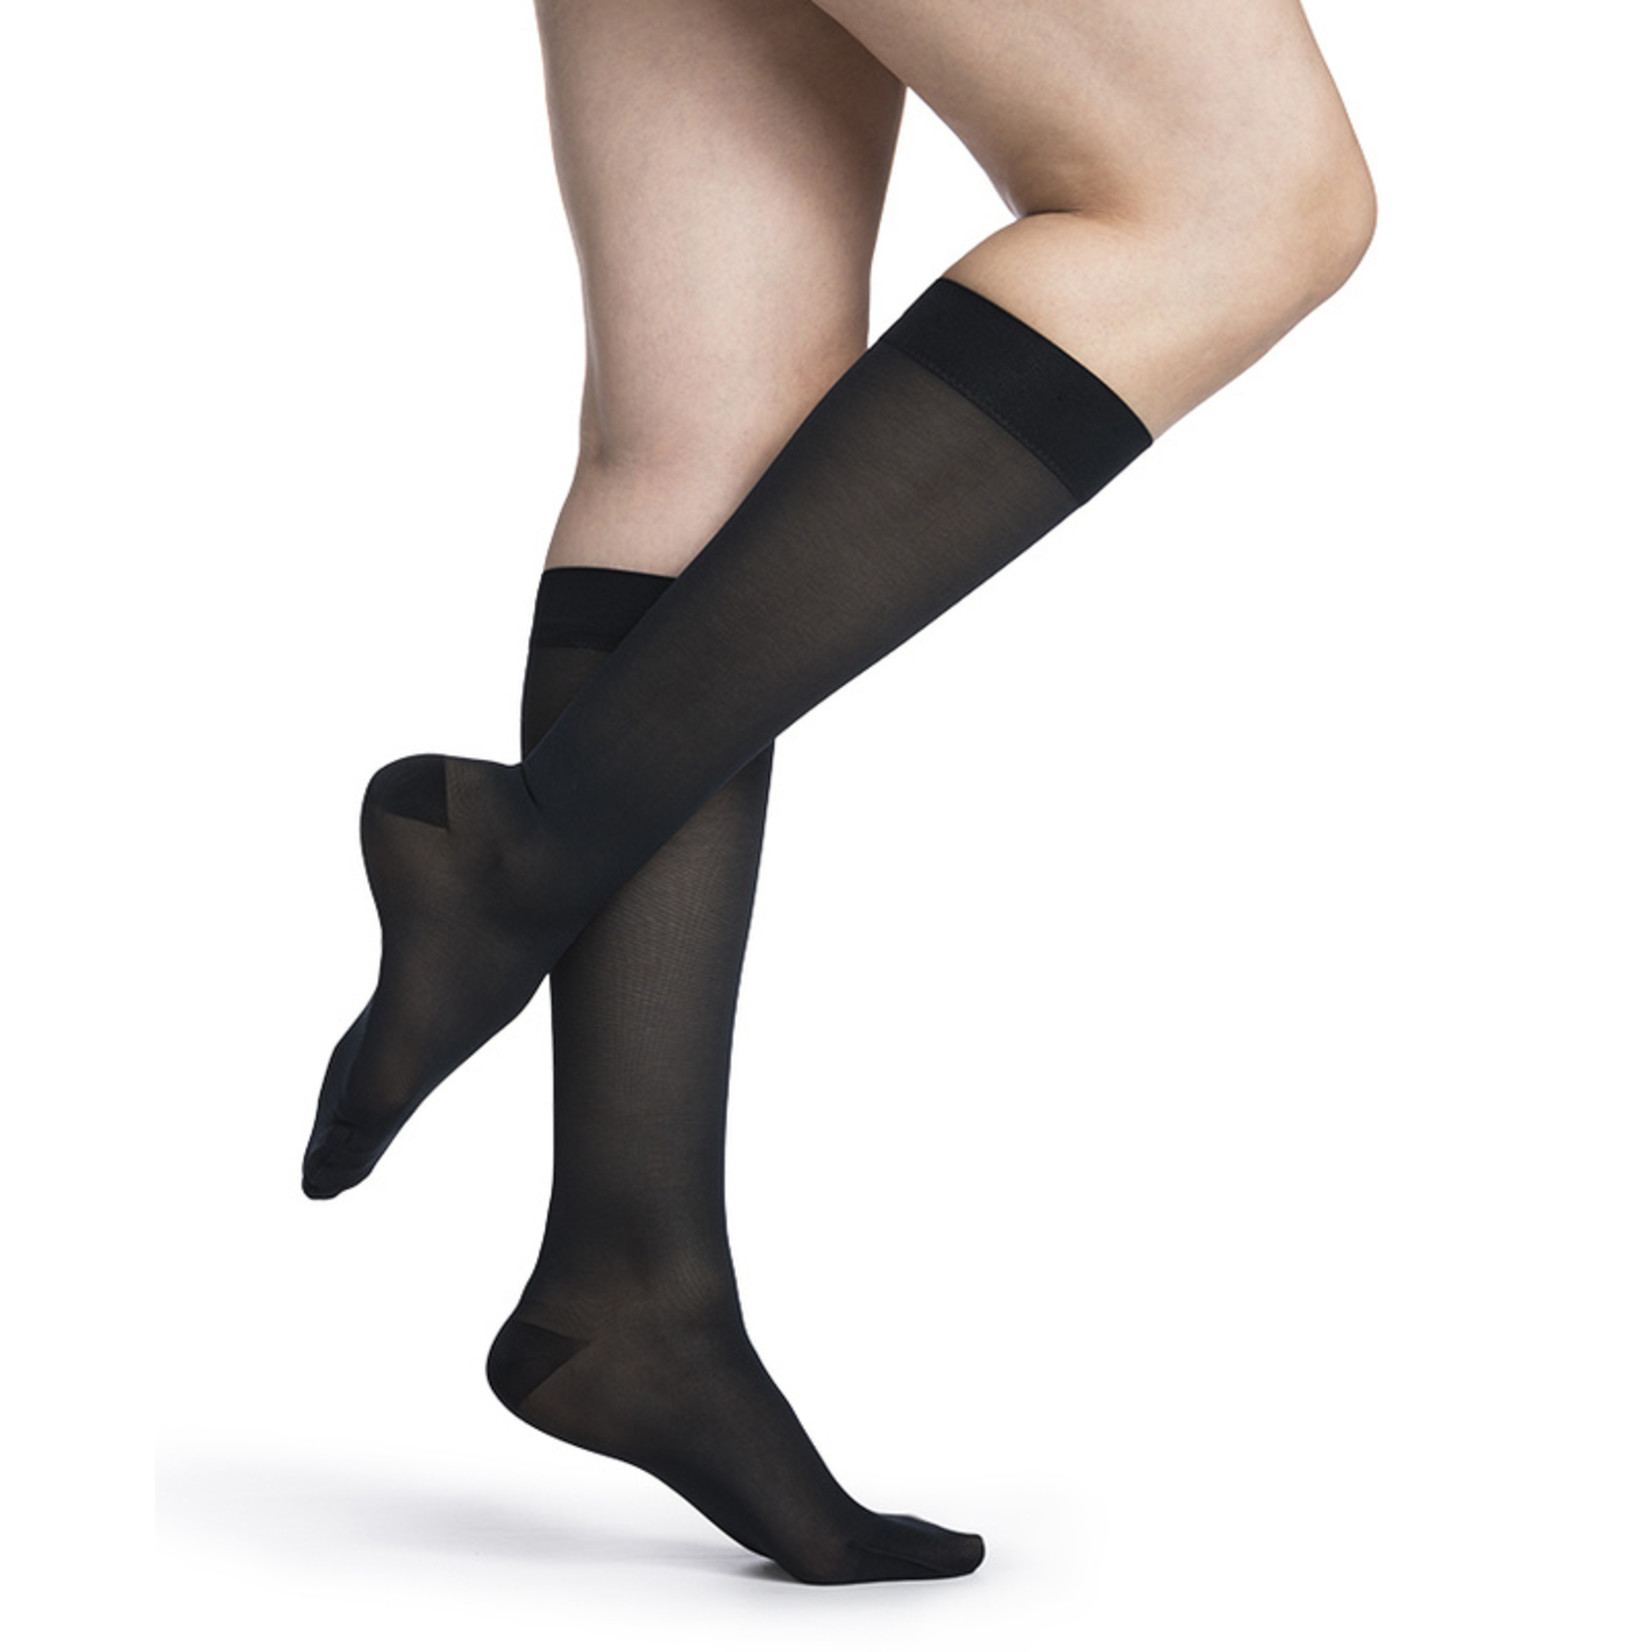 SIGVARIS Women's Style Medium Sheer Calf 20-30mmHg